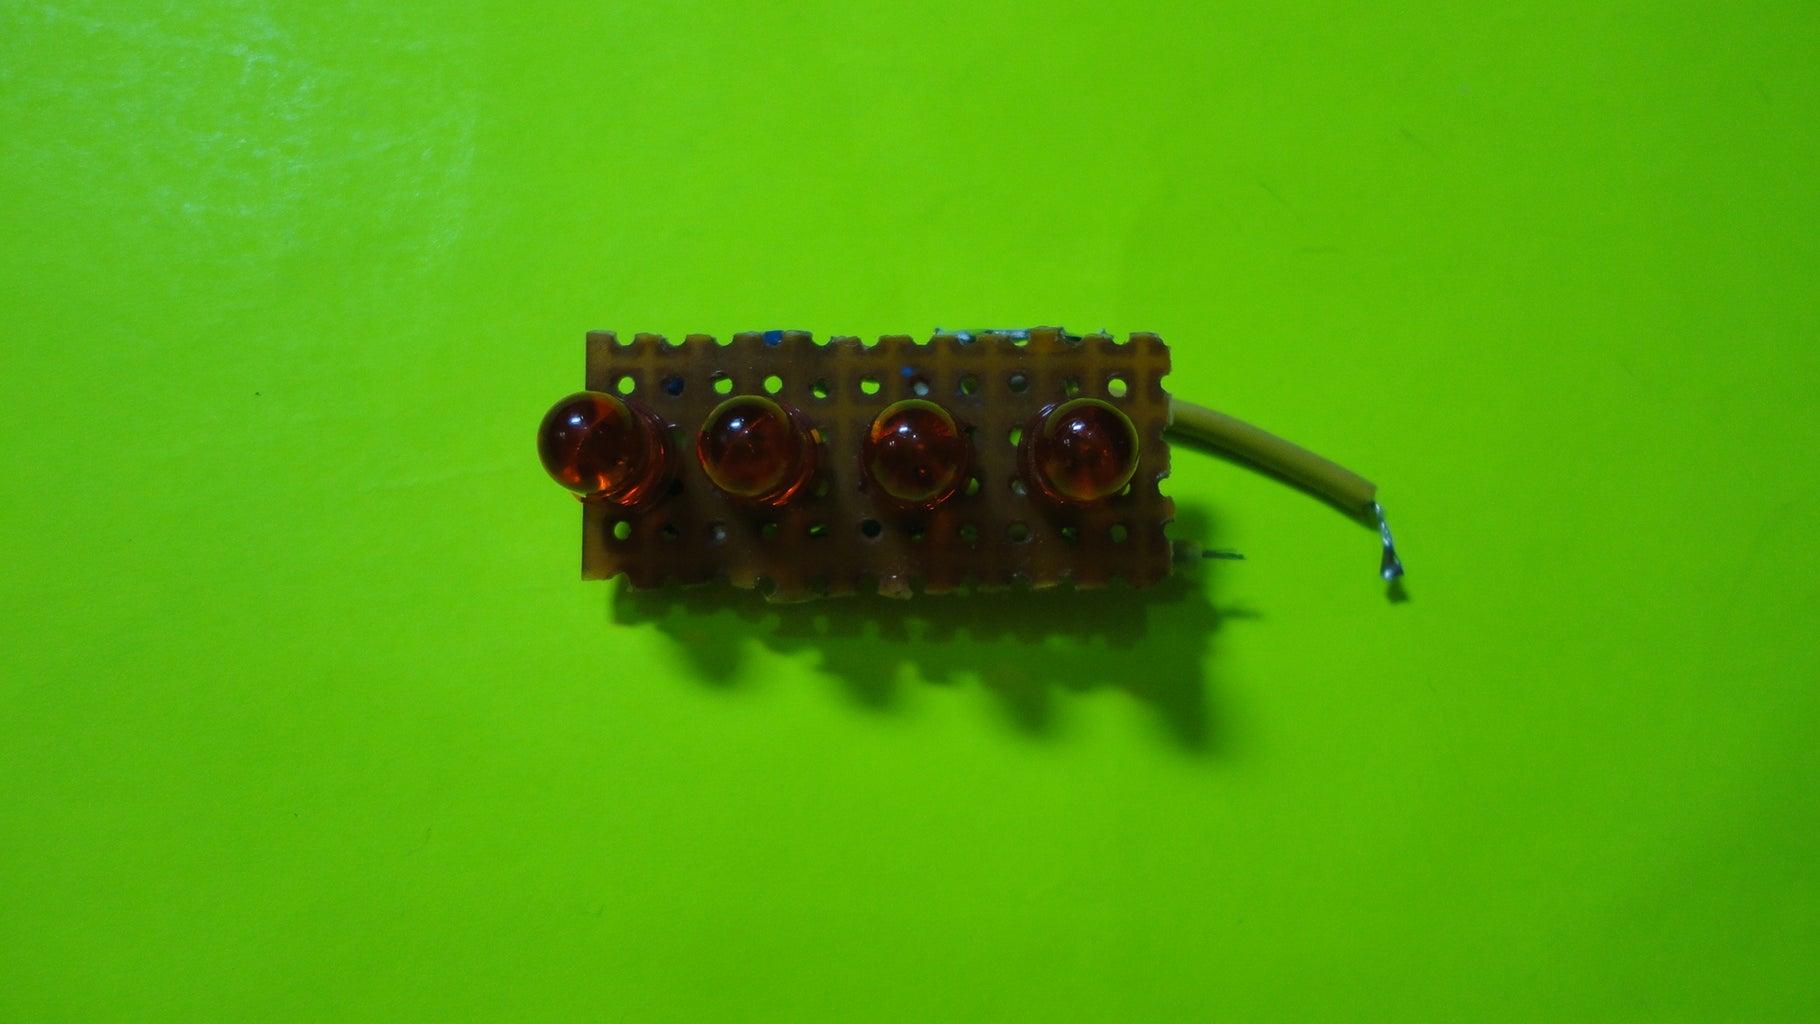 Making the LED Circuit